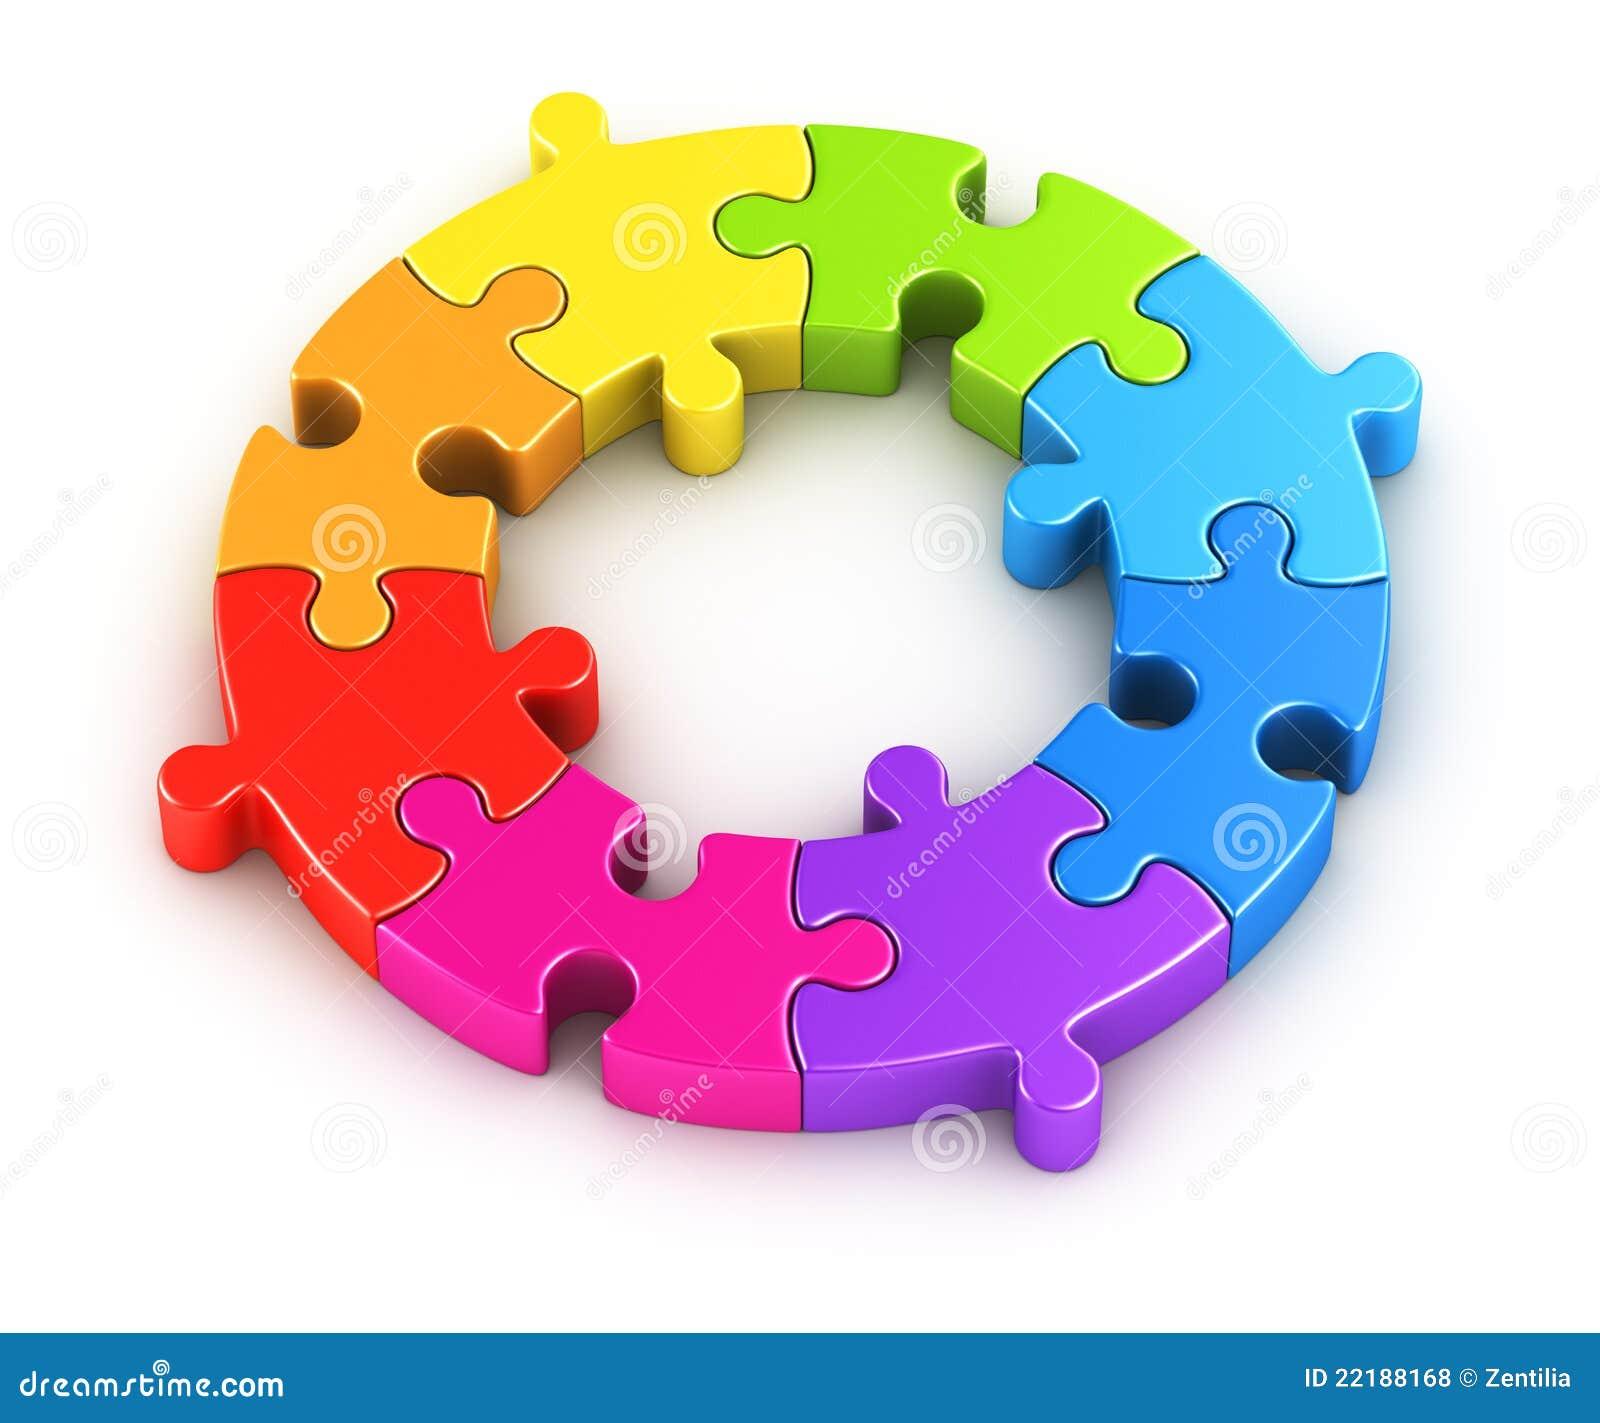 Circular Puzzle Royalty Free Stock Photos Image 22188168